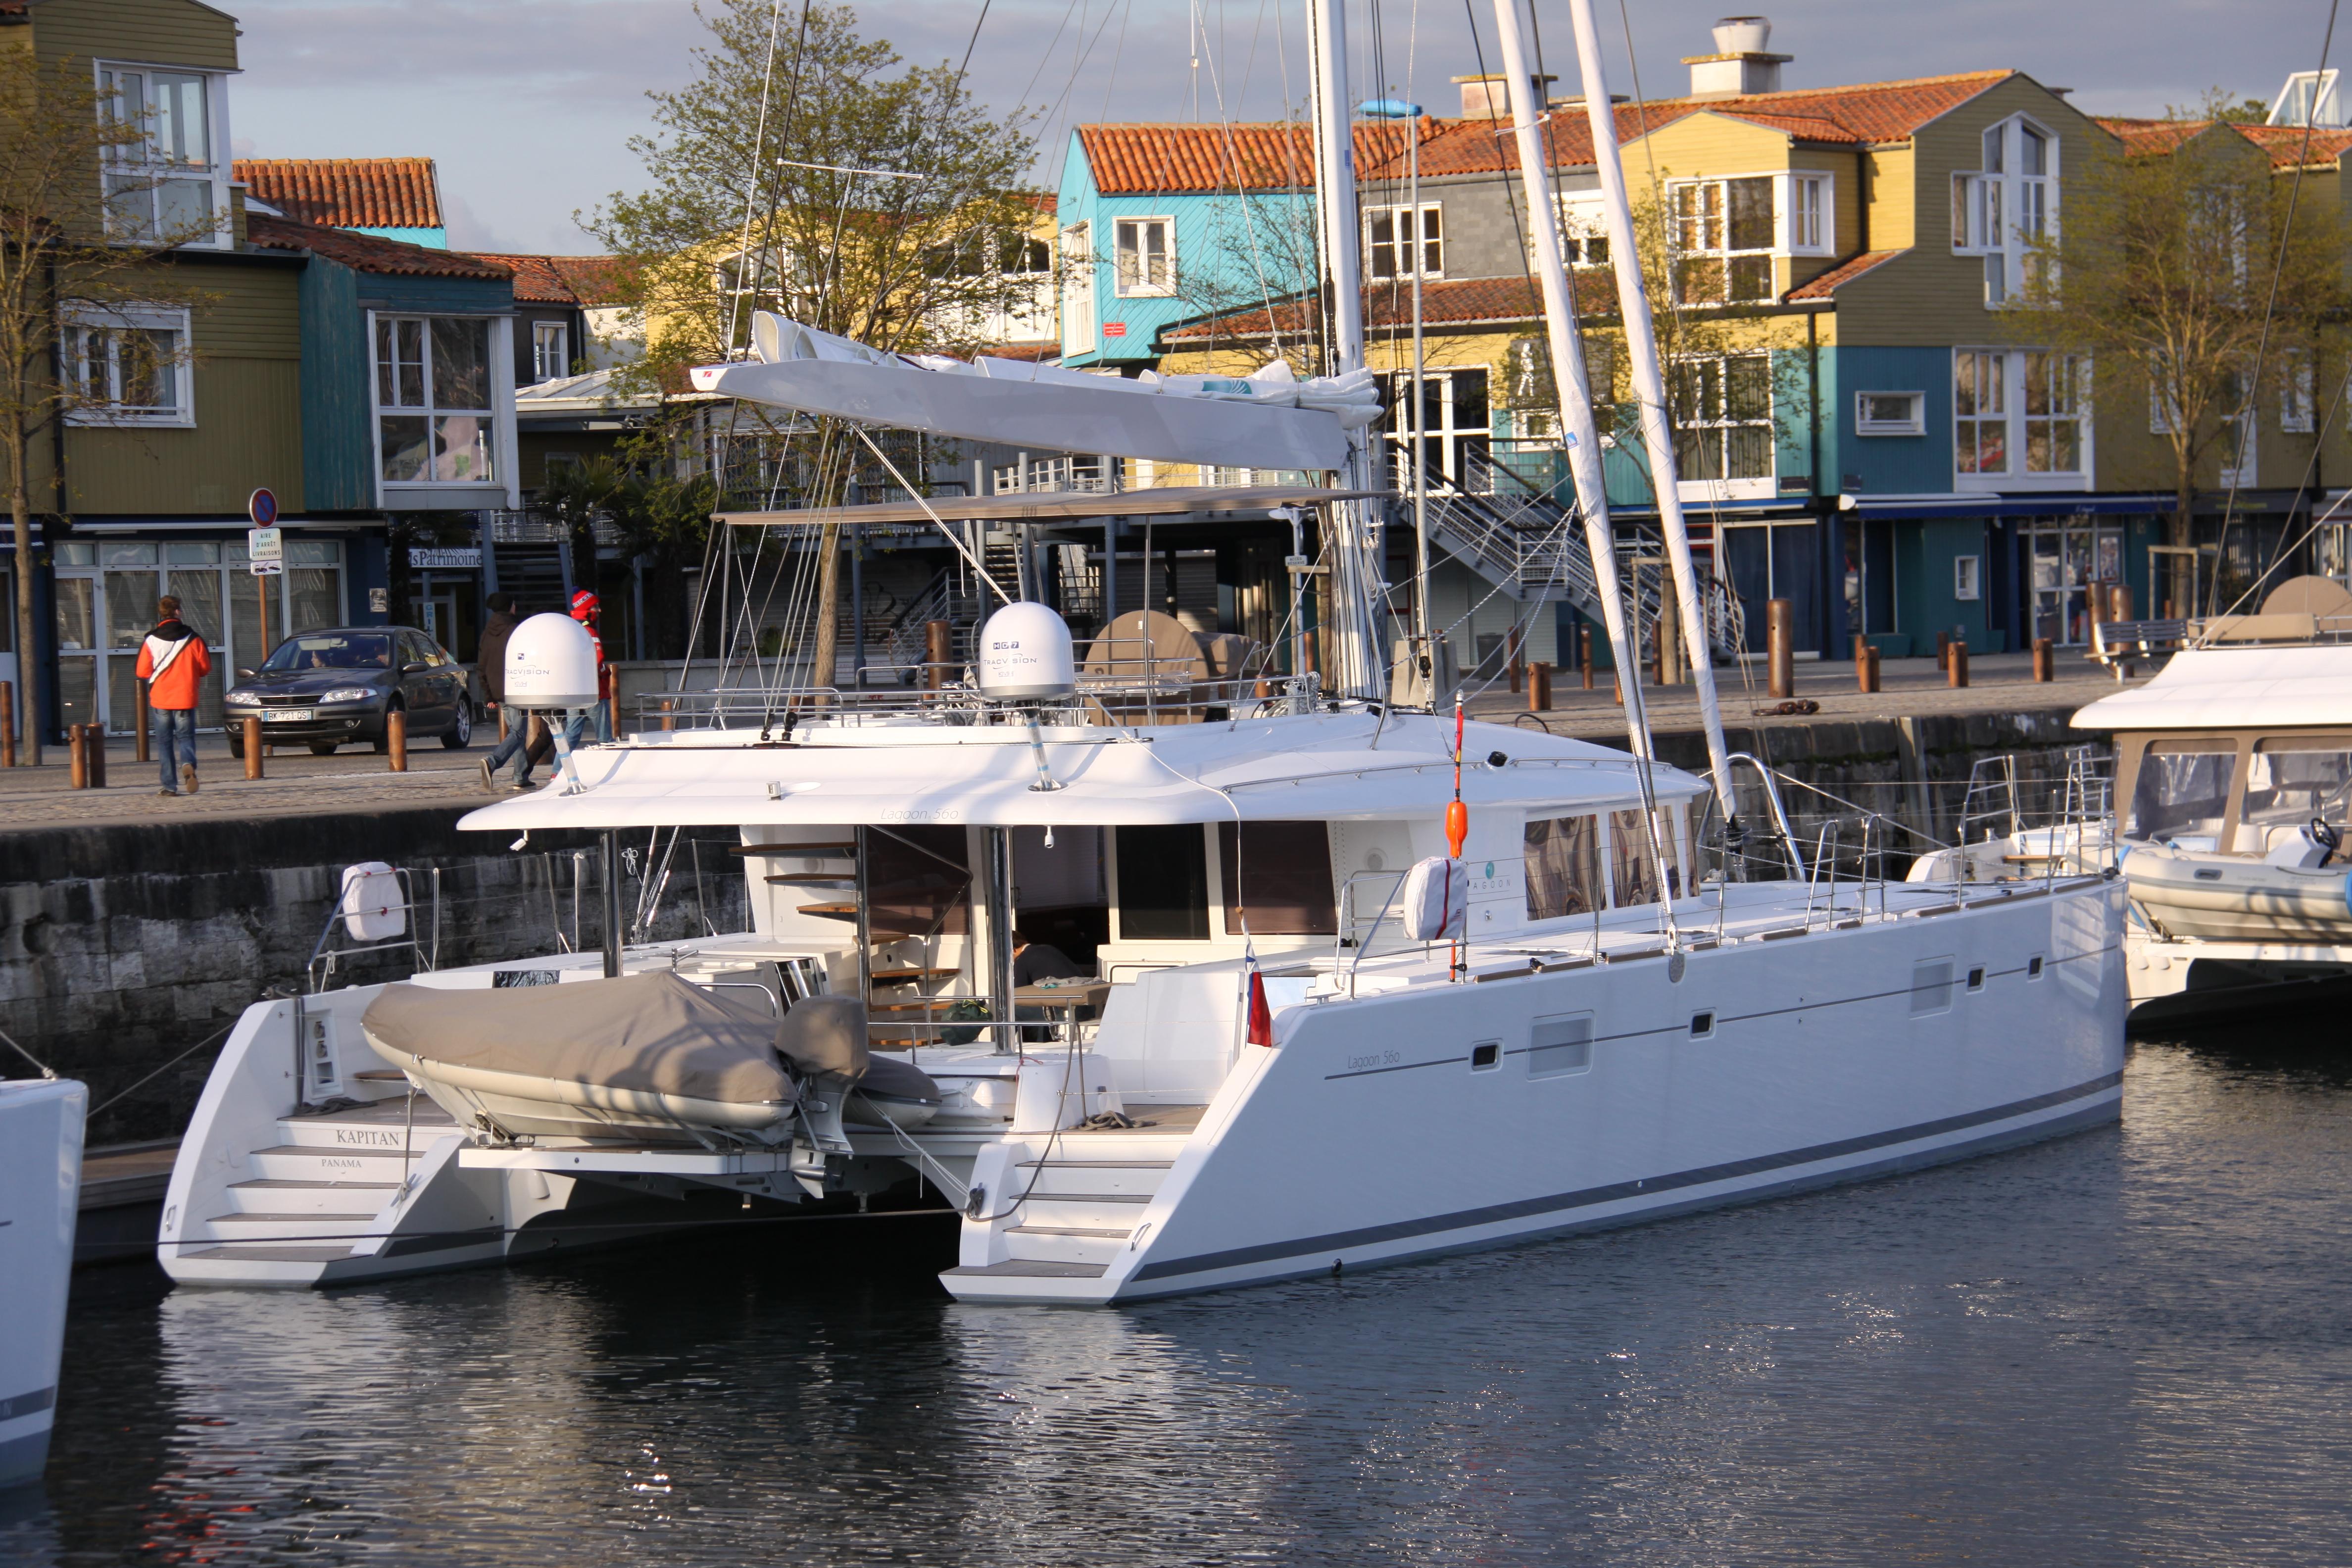 Segelkatamaran  File:Catamaran de croisière Lagoon 560.JPG - Wikimedia Commons